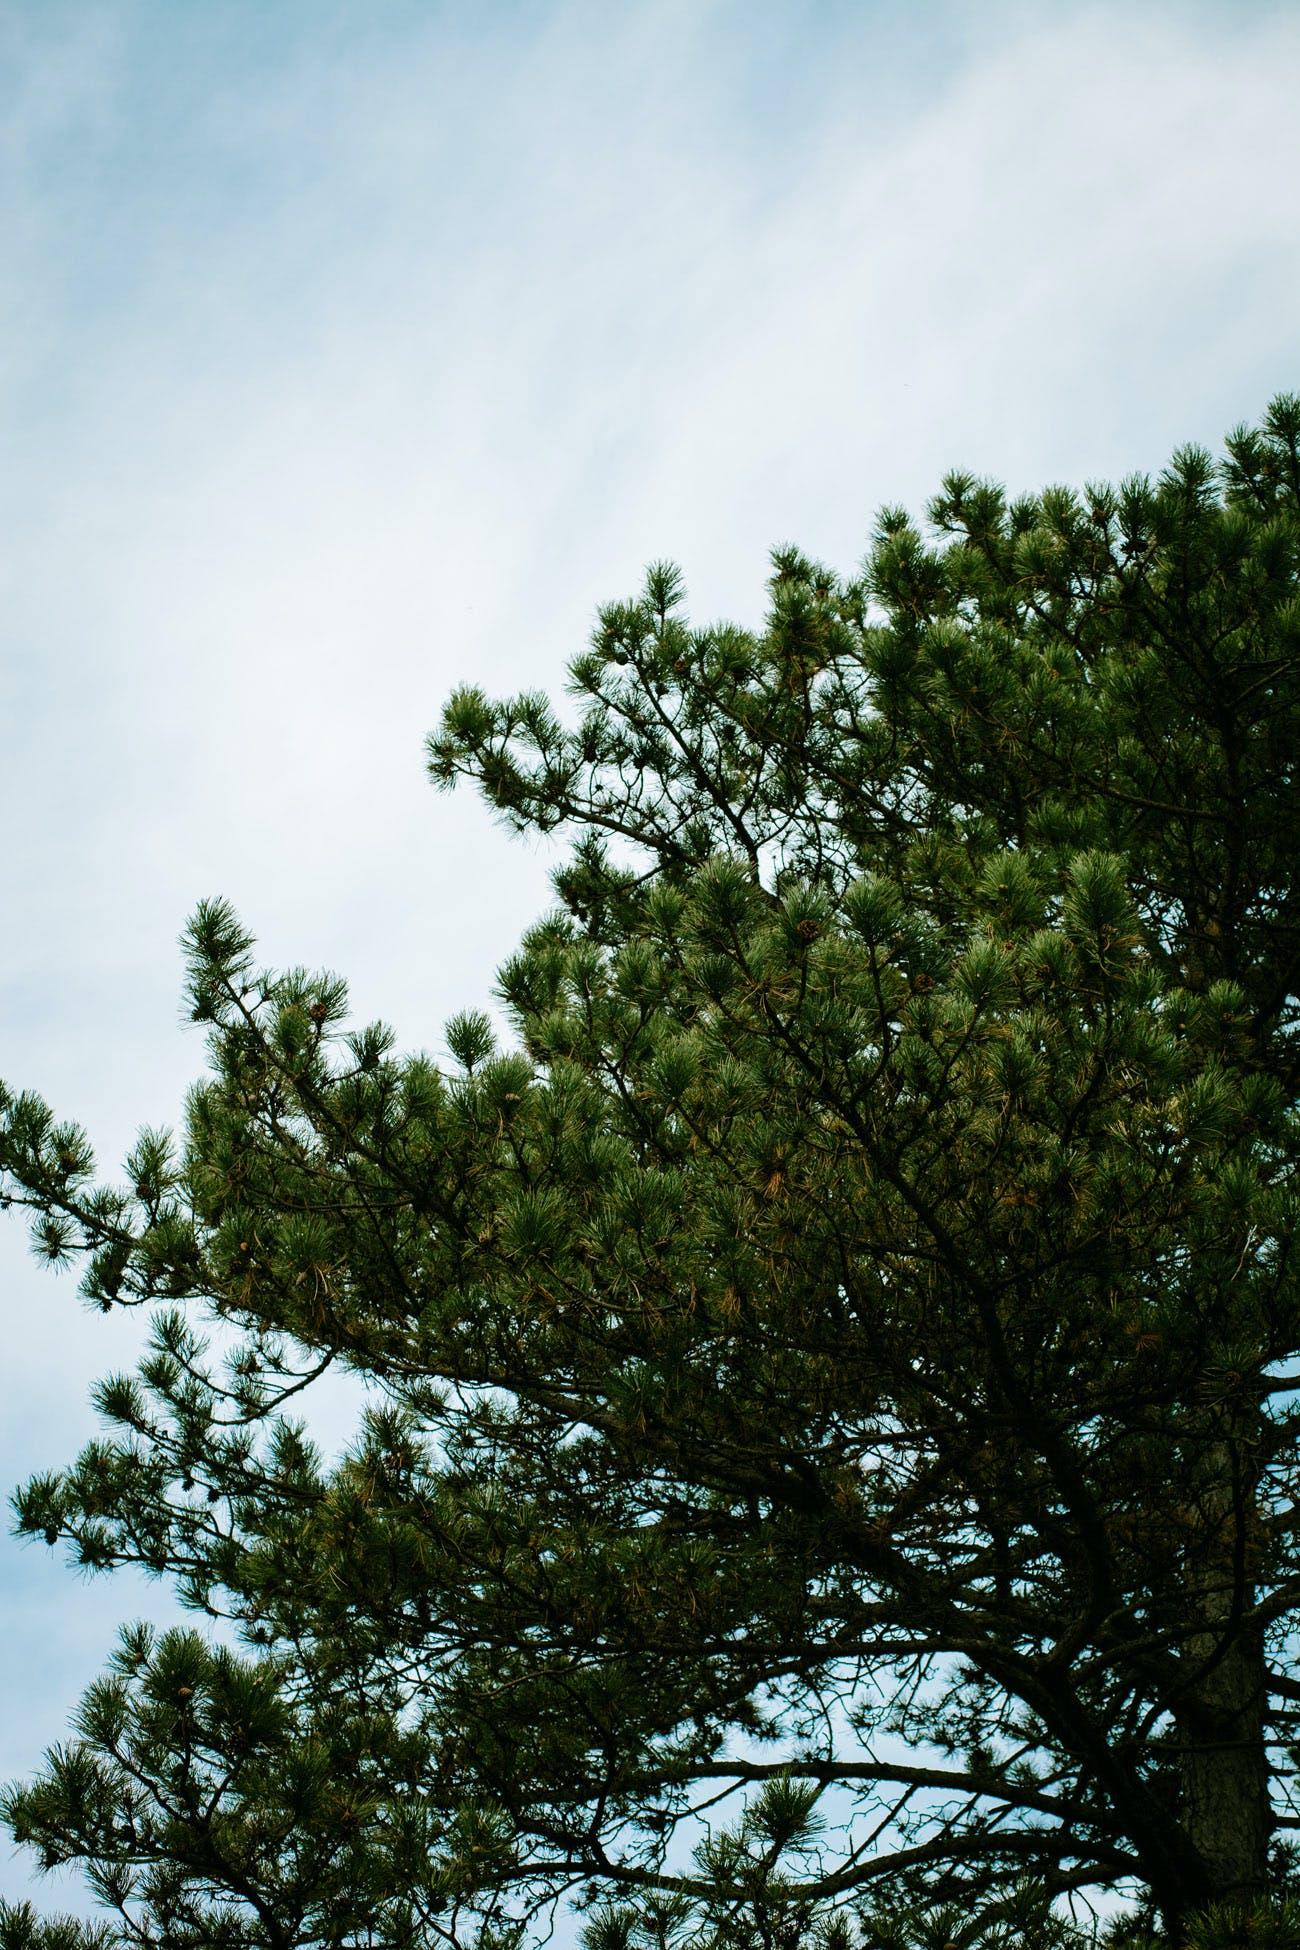 Free stock photo of sky, clouds, tree, pine needles